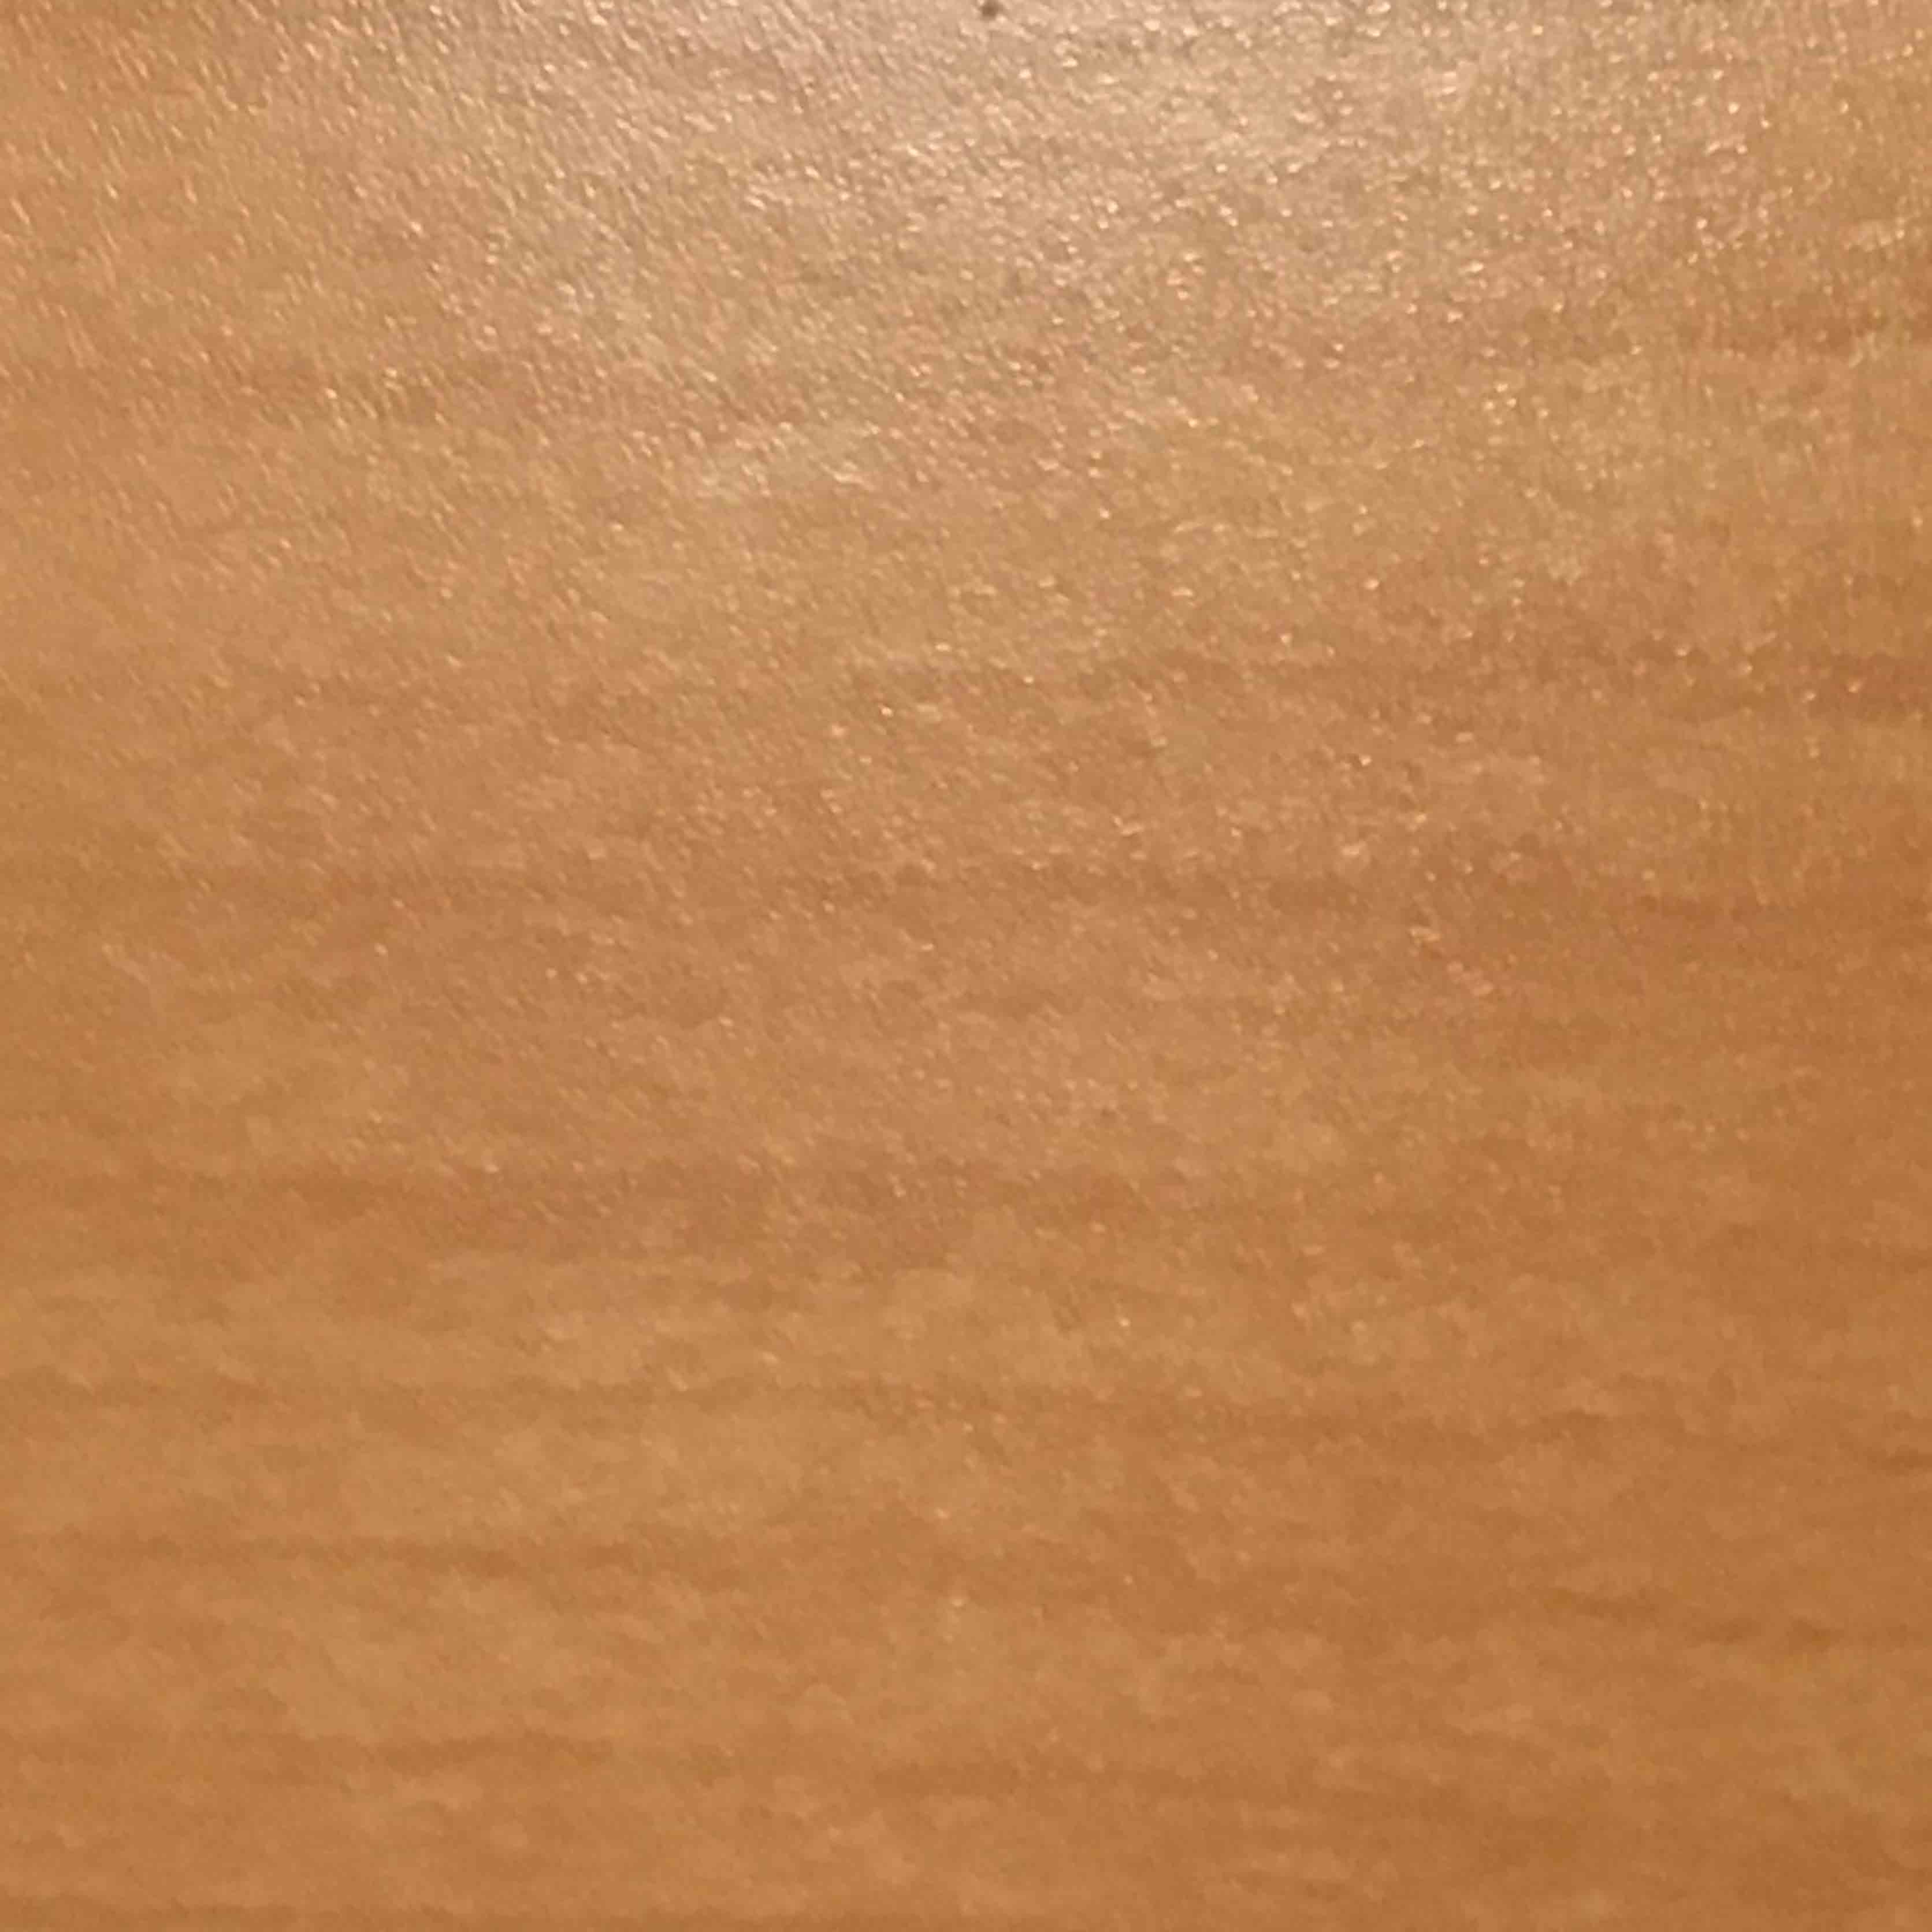 Decal vân gỗ - 3785-9